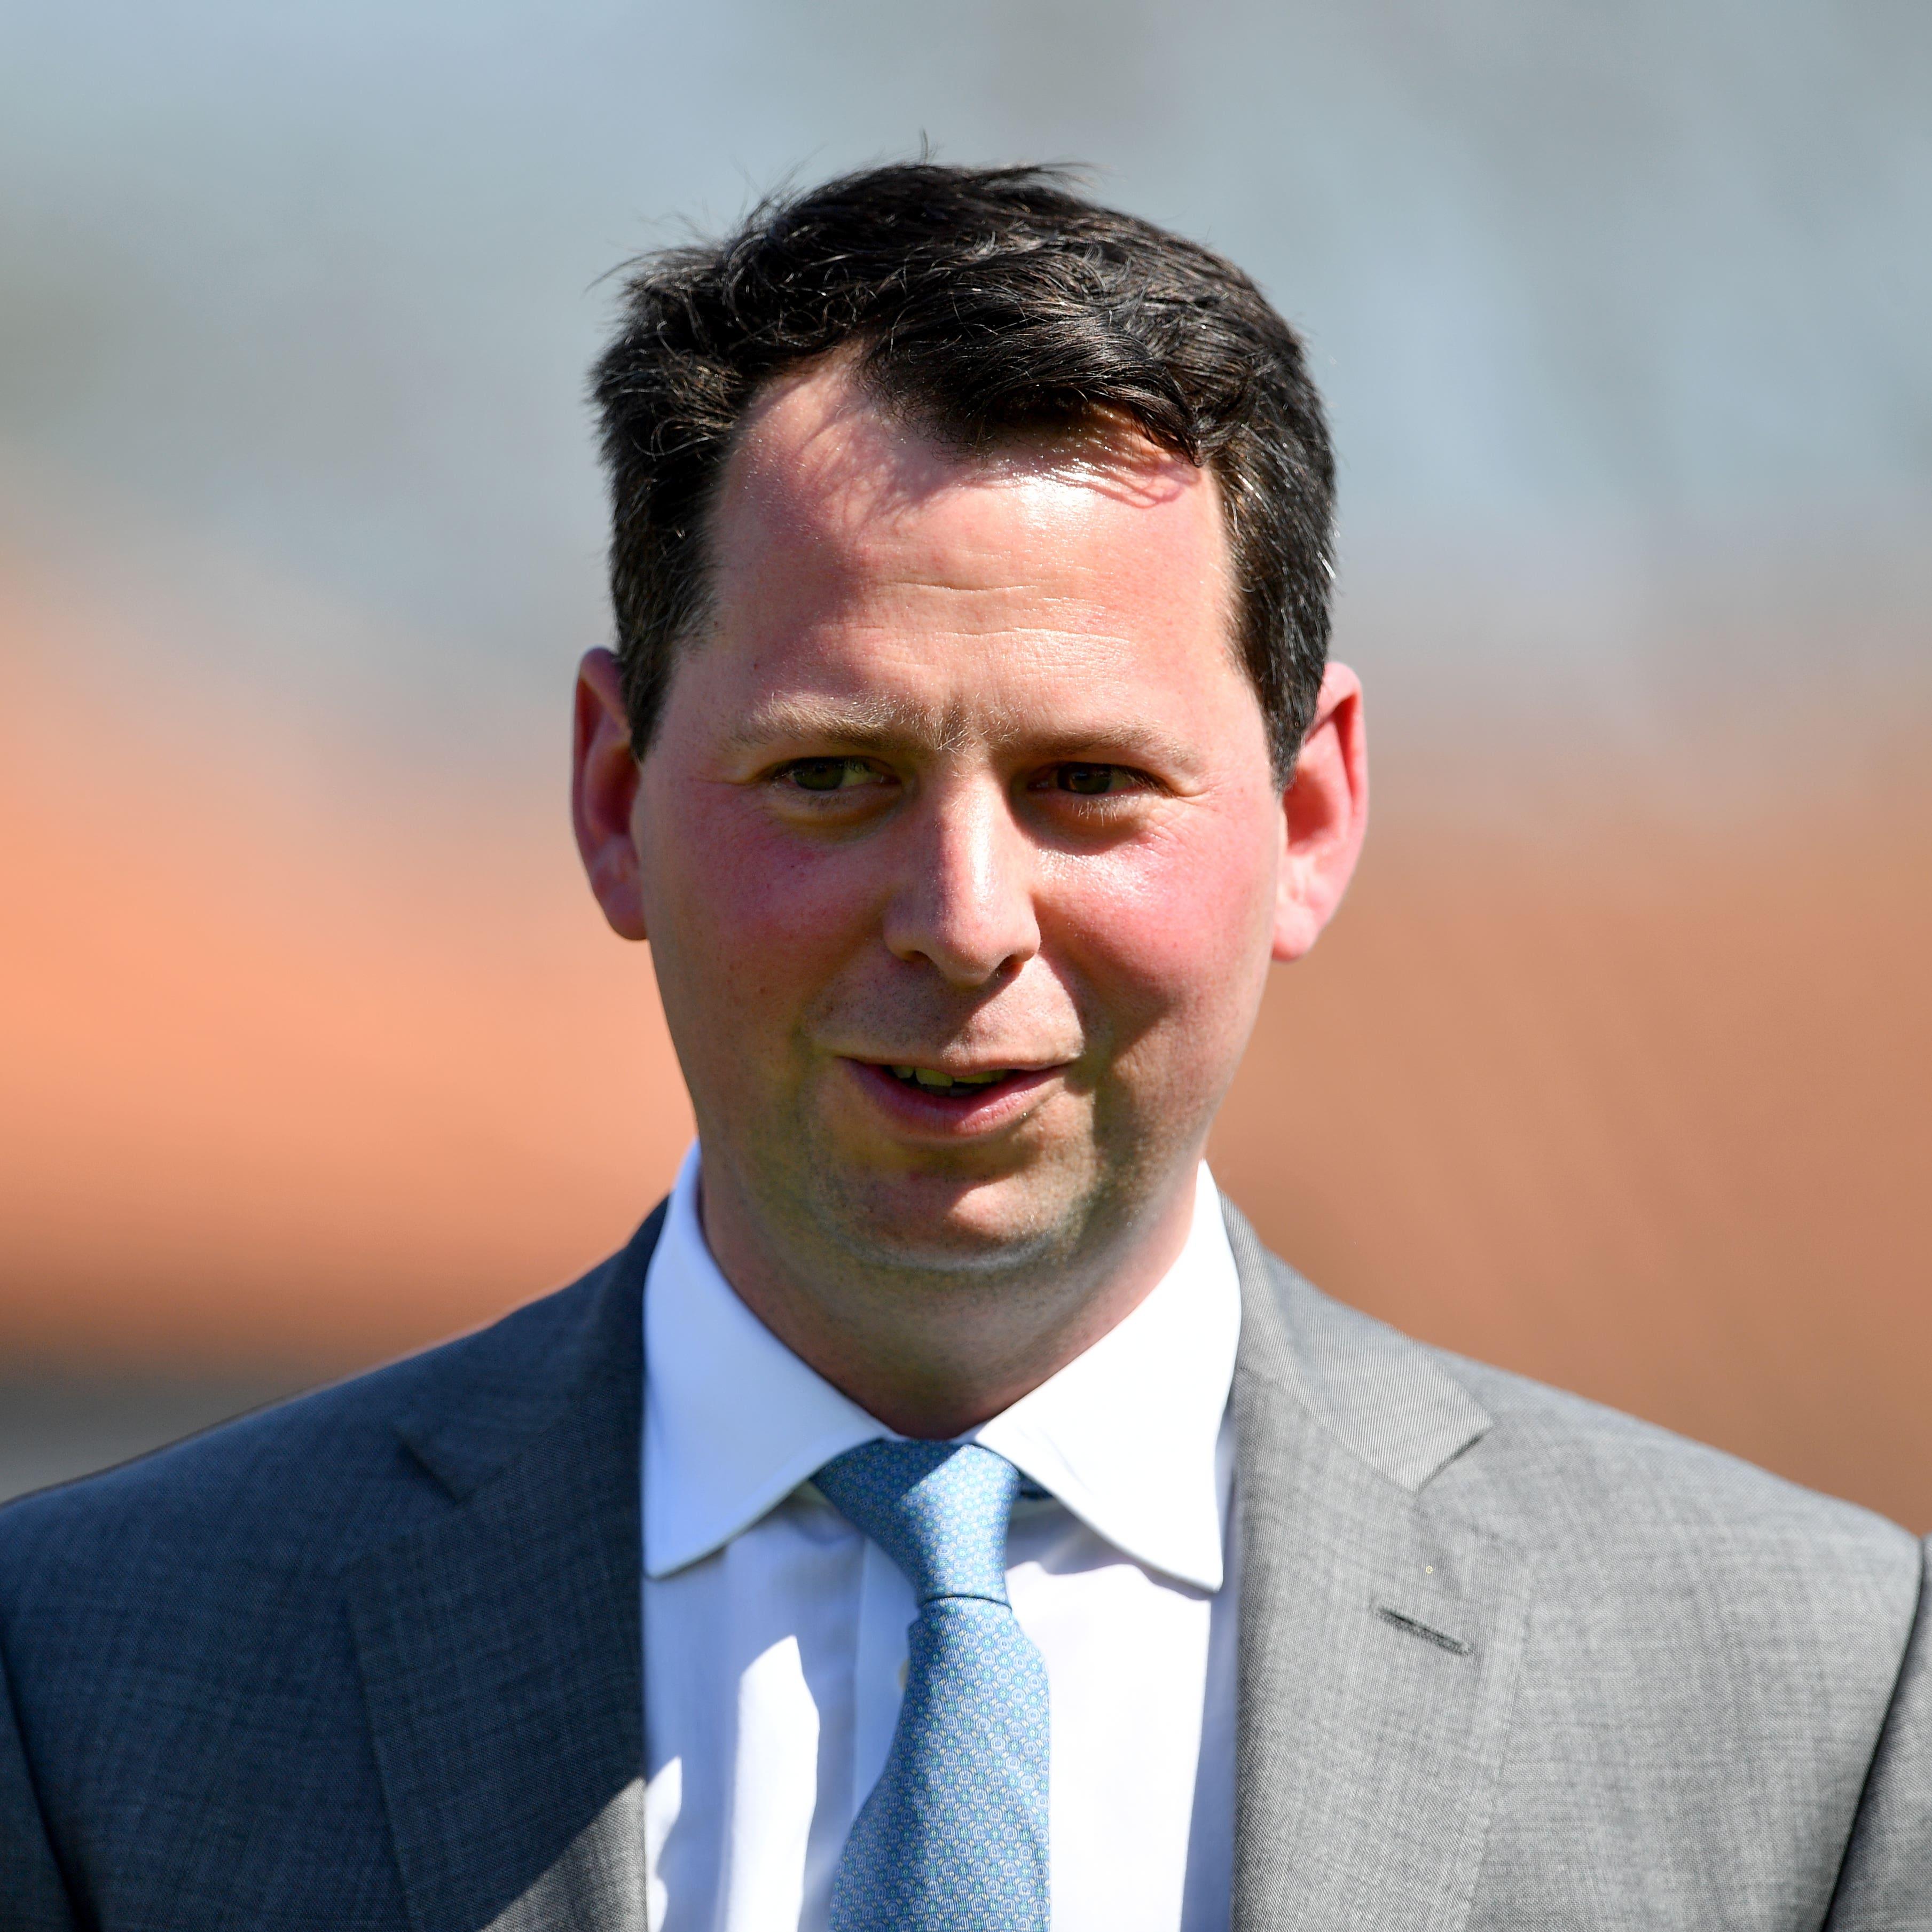 Charlie Hills is eyeing Royal Ascot for his Newbury winner Khaadem